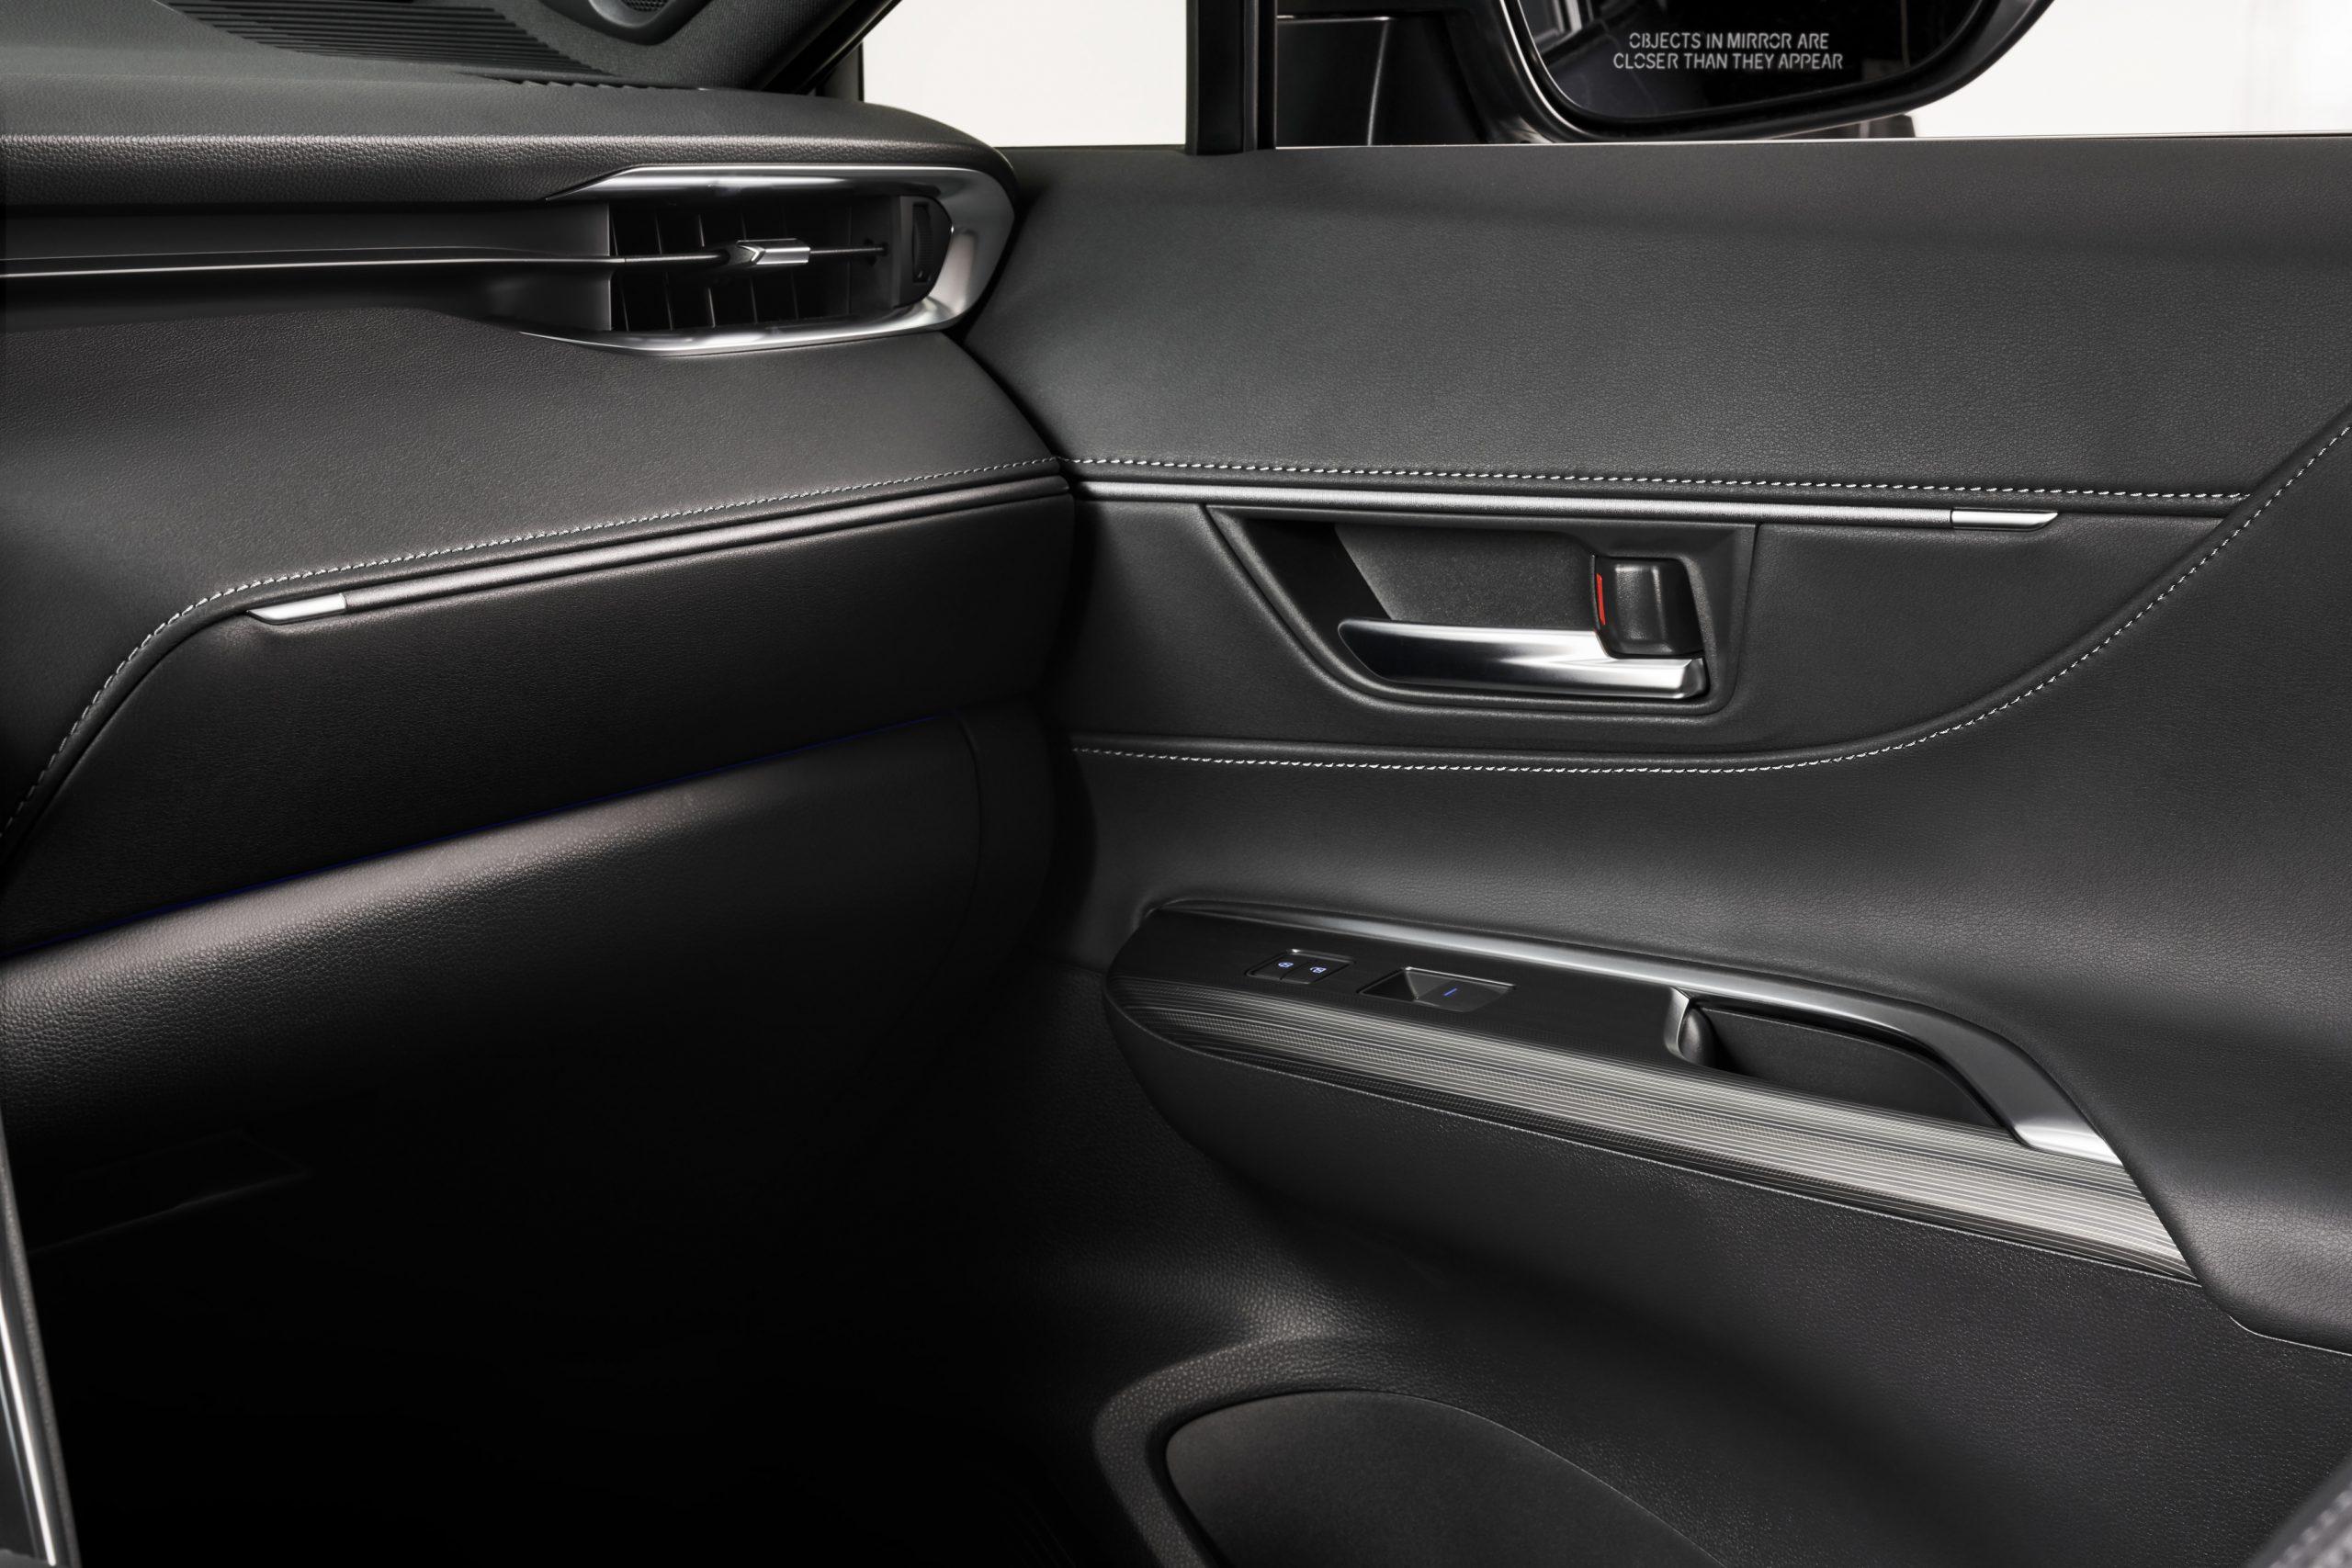 2021-Toyota-Venza_Interior_006-scaled.jpg